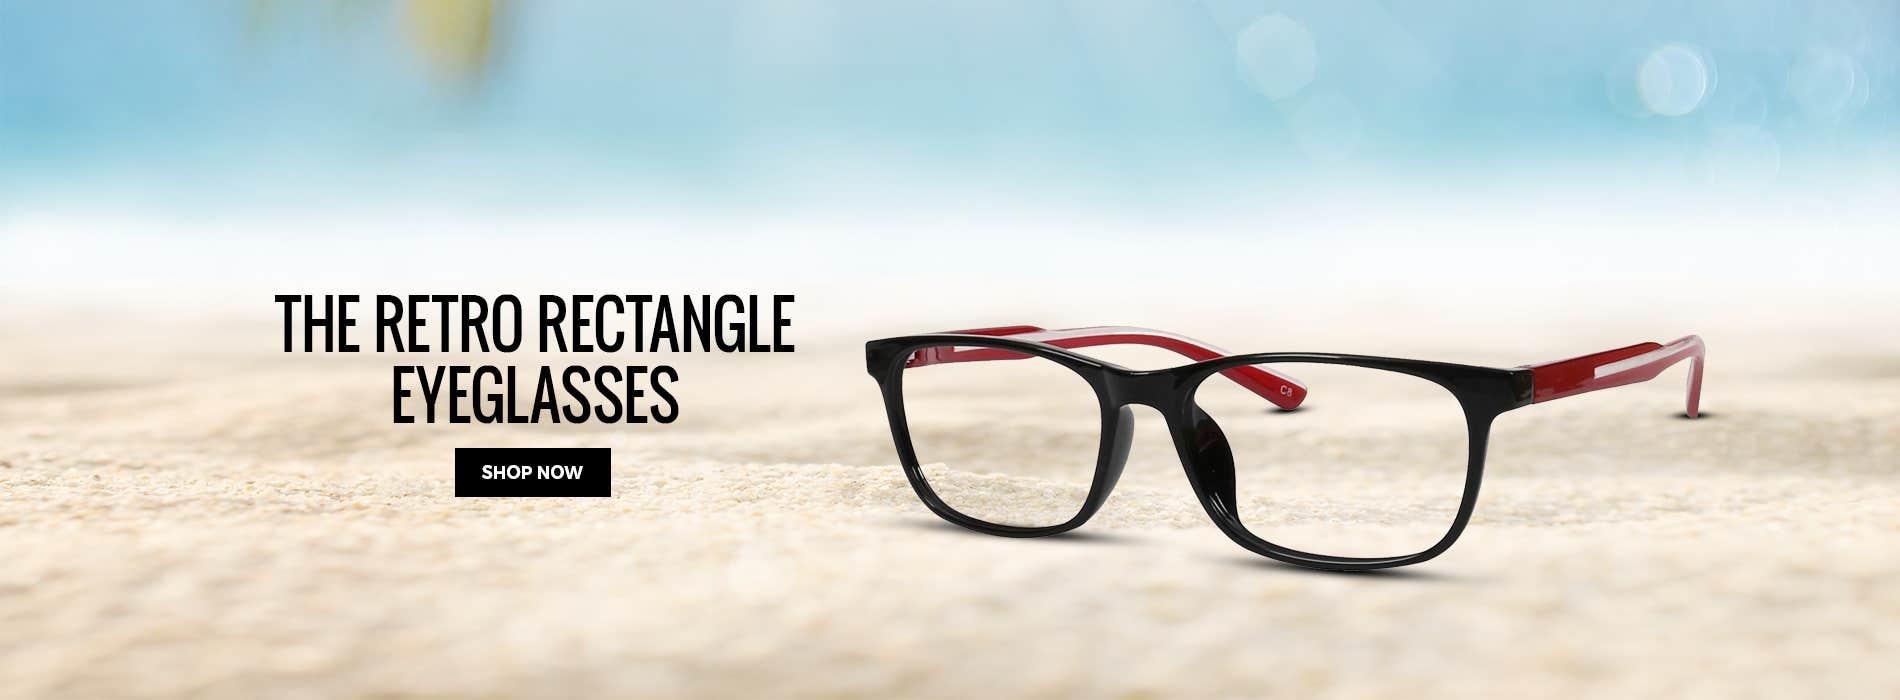 The Retro Rectangle Eyeglasses